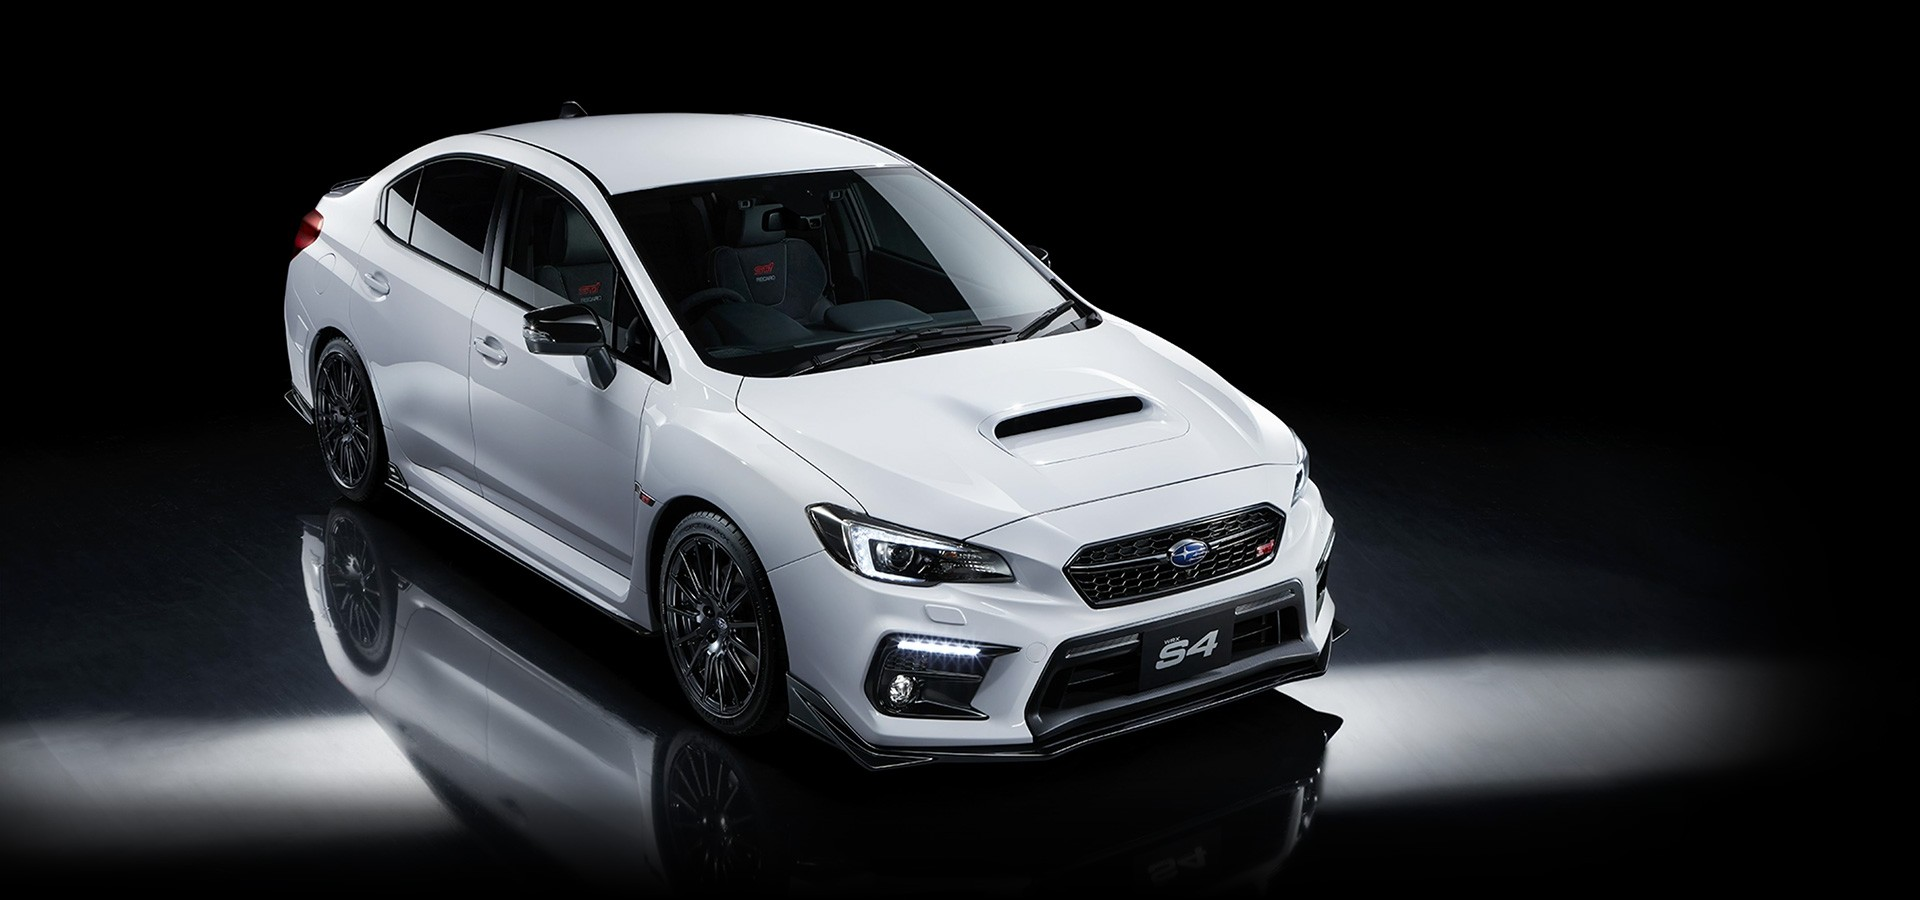 Subaru-WRX-S4-STI-Sport-9-